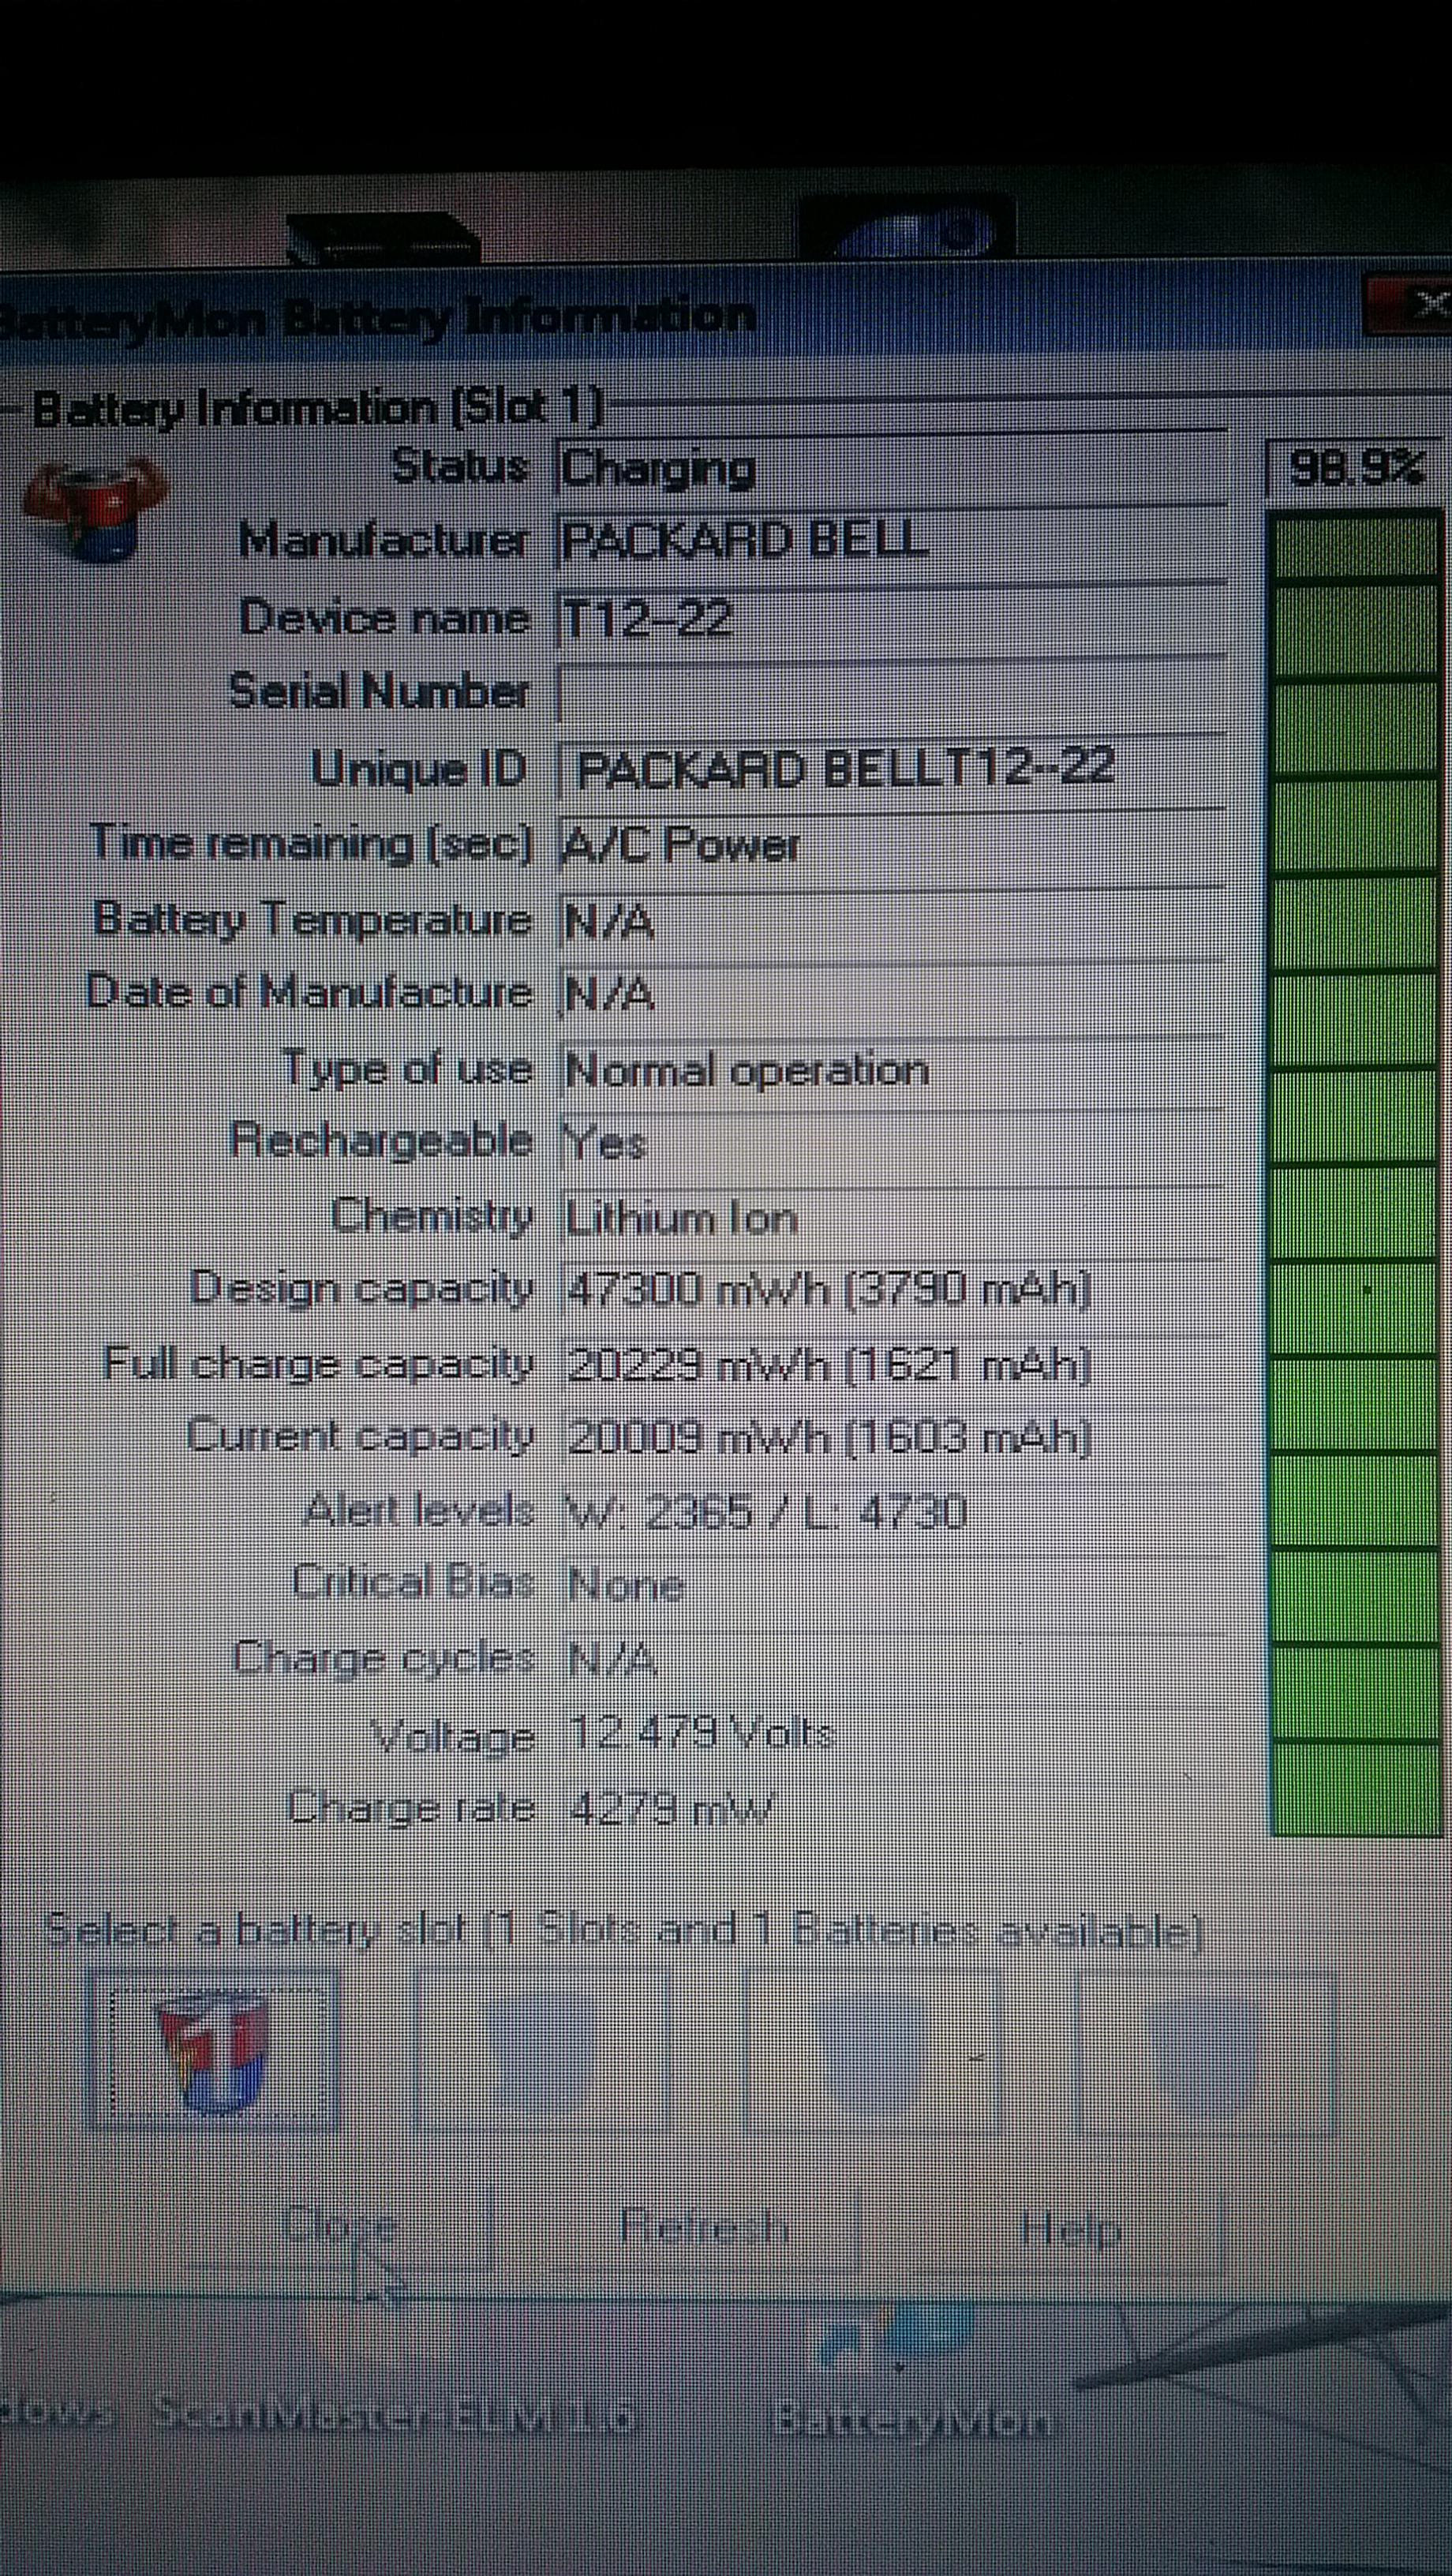 Packard bell padnieta bateria , nowej nie chce �adowac